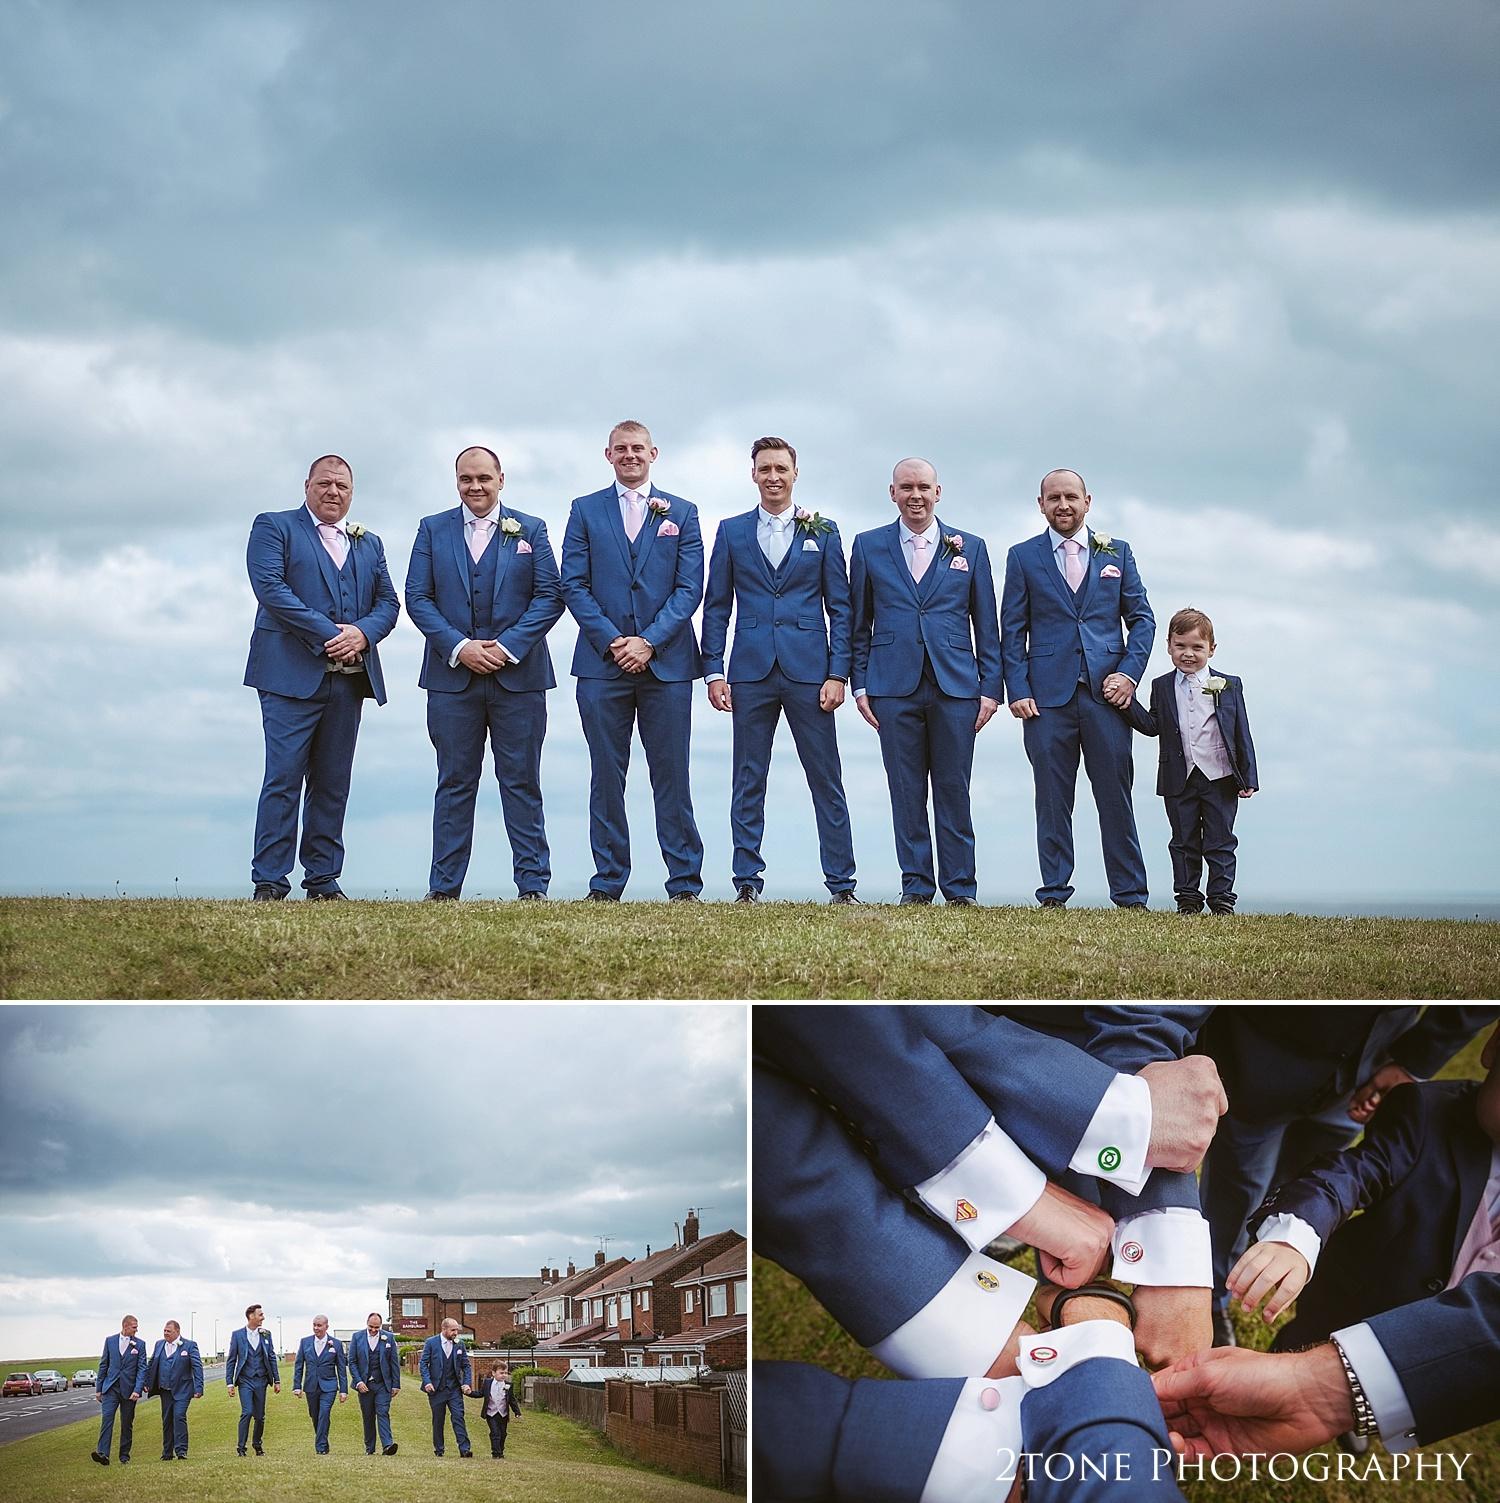 The groomsmen by Durham based wedding photographers www.2tonephotography.co.uk